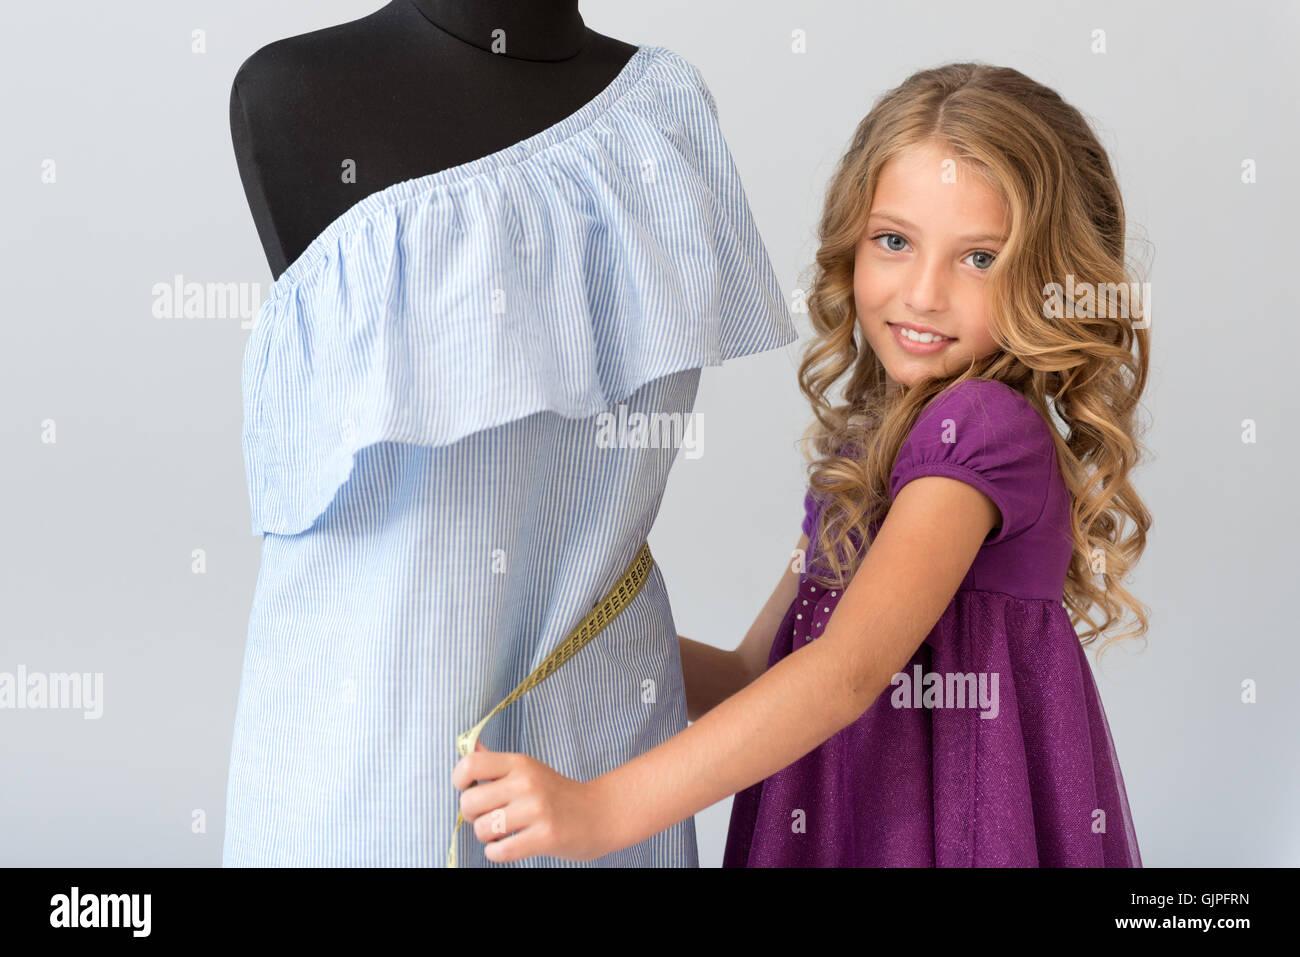 Fascinating girl taking waist measurement - Stock Image